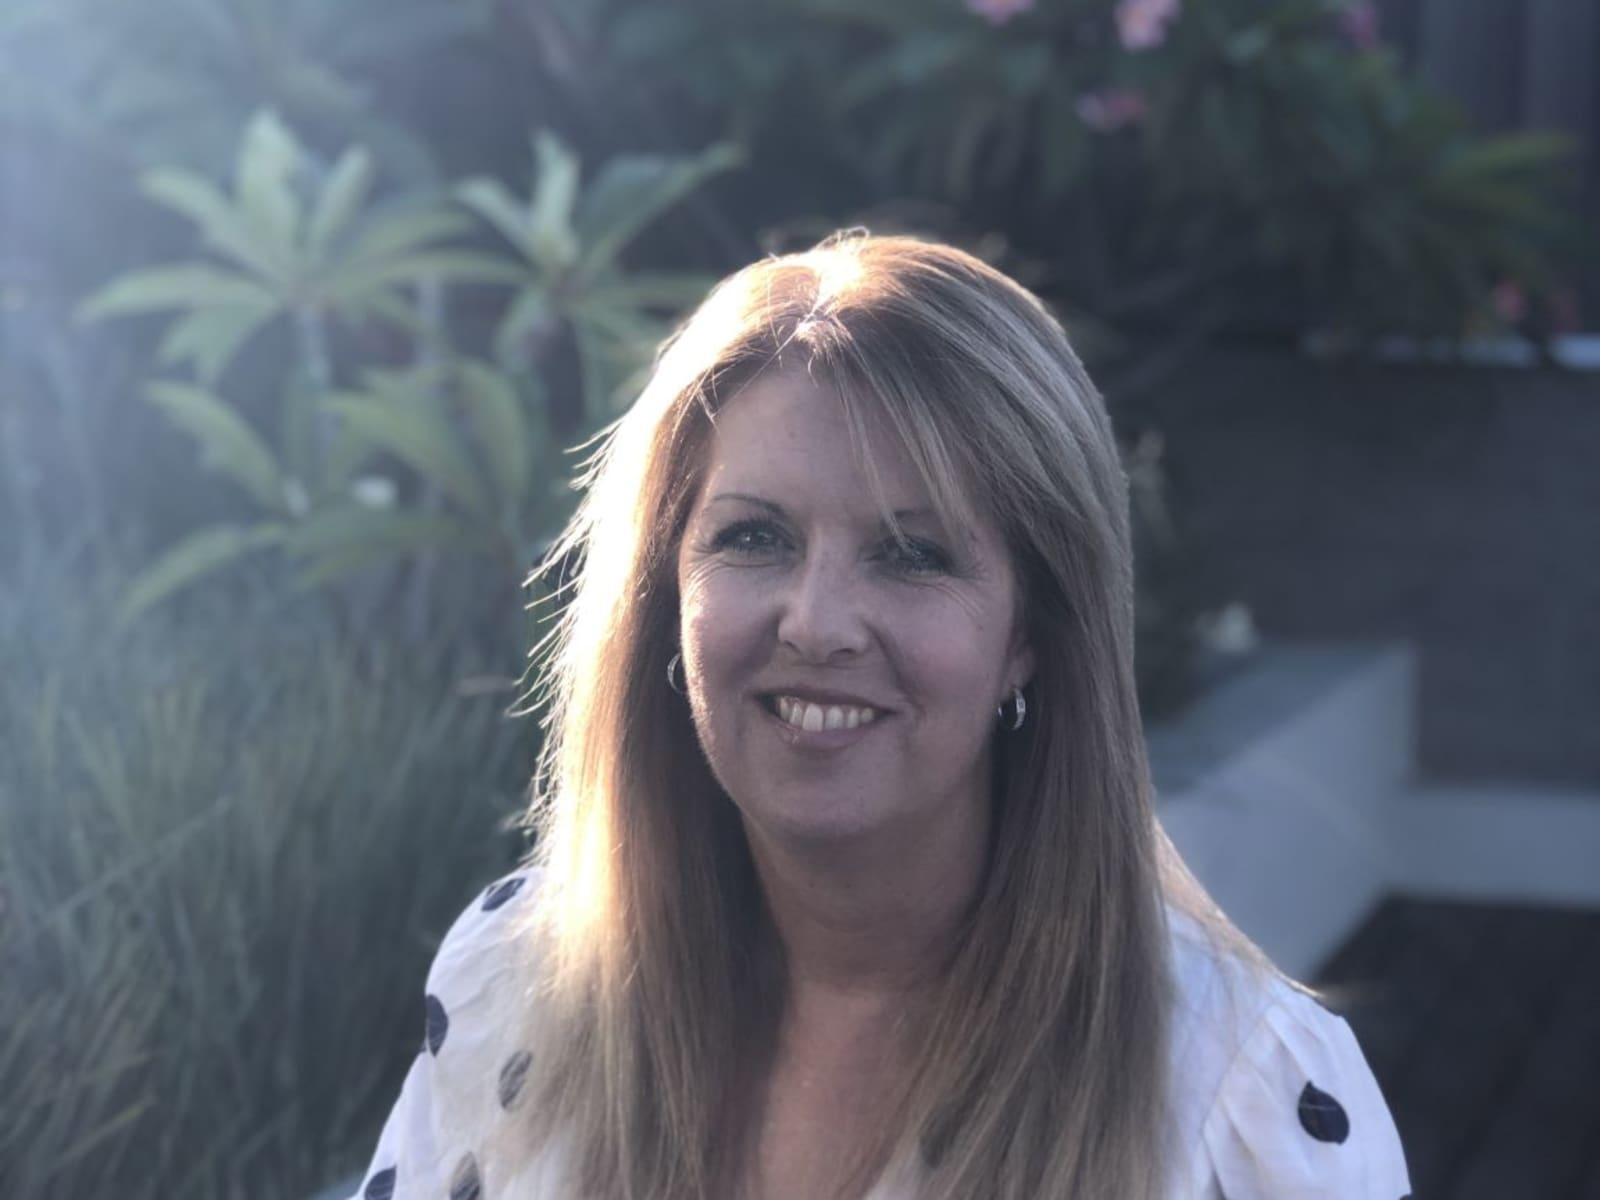 Sharon from Gold Coast, Queensland, Australia